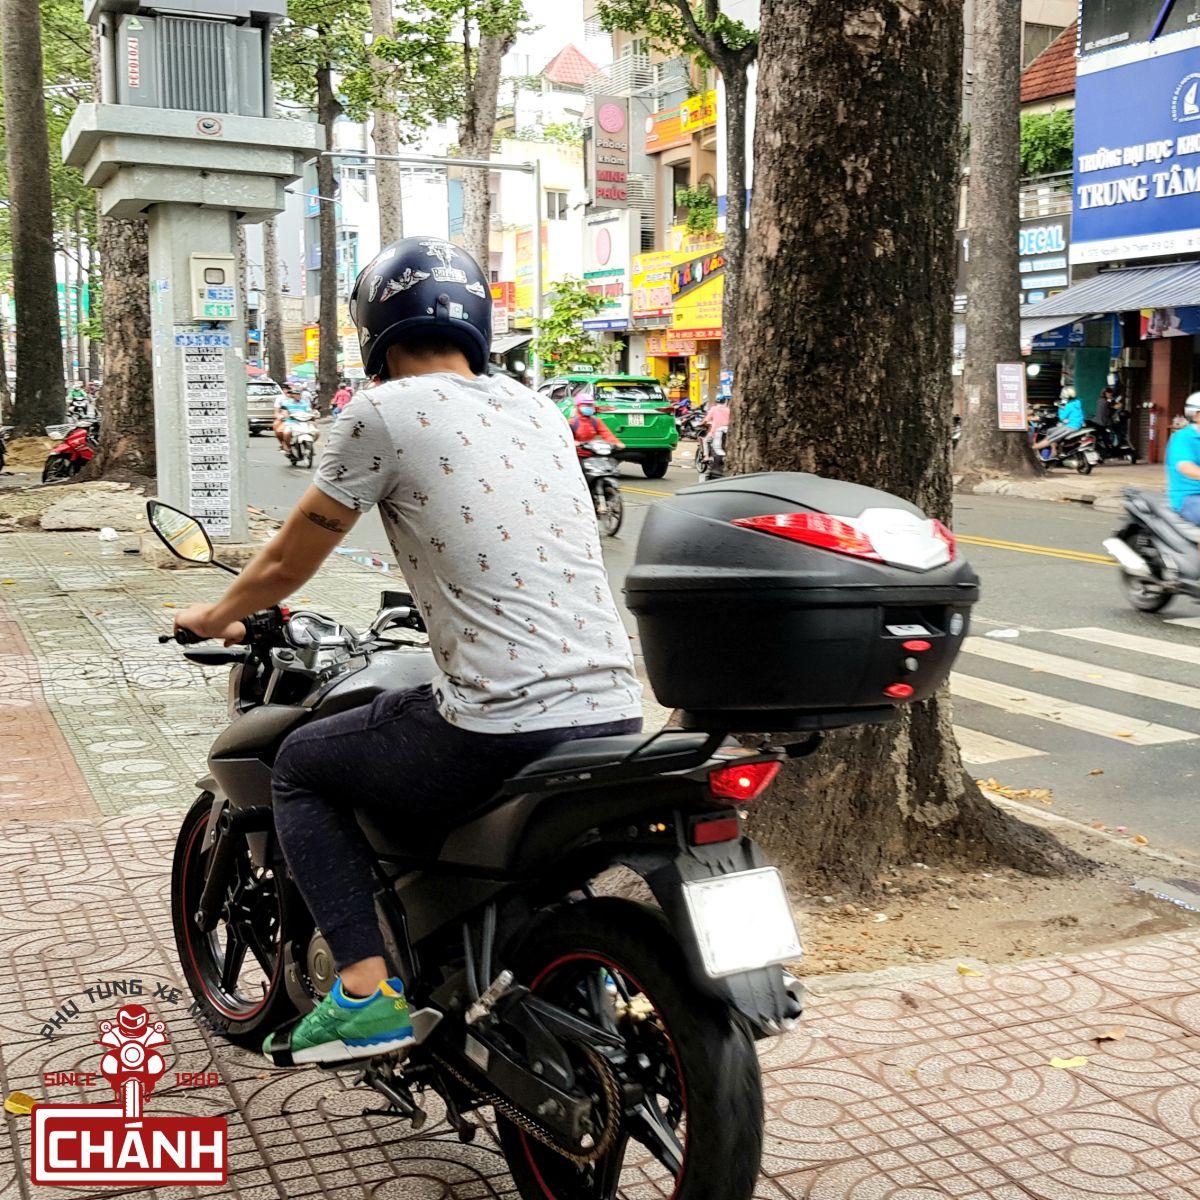 thung-sau-xe-may-loai-to-chinh-hang-givi-14